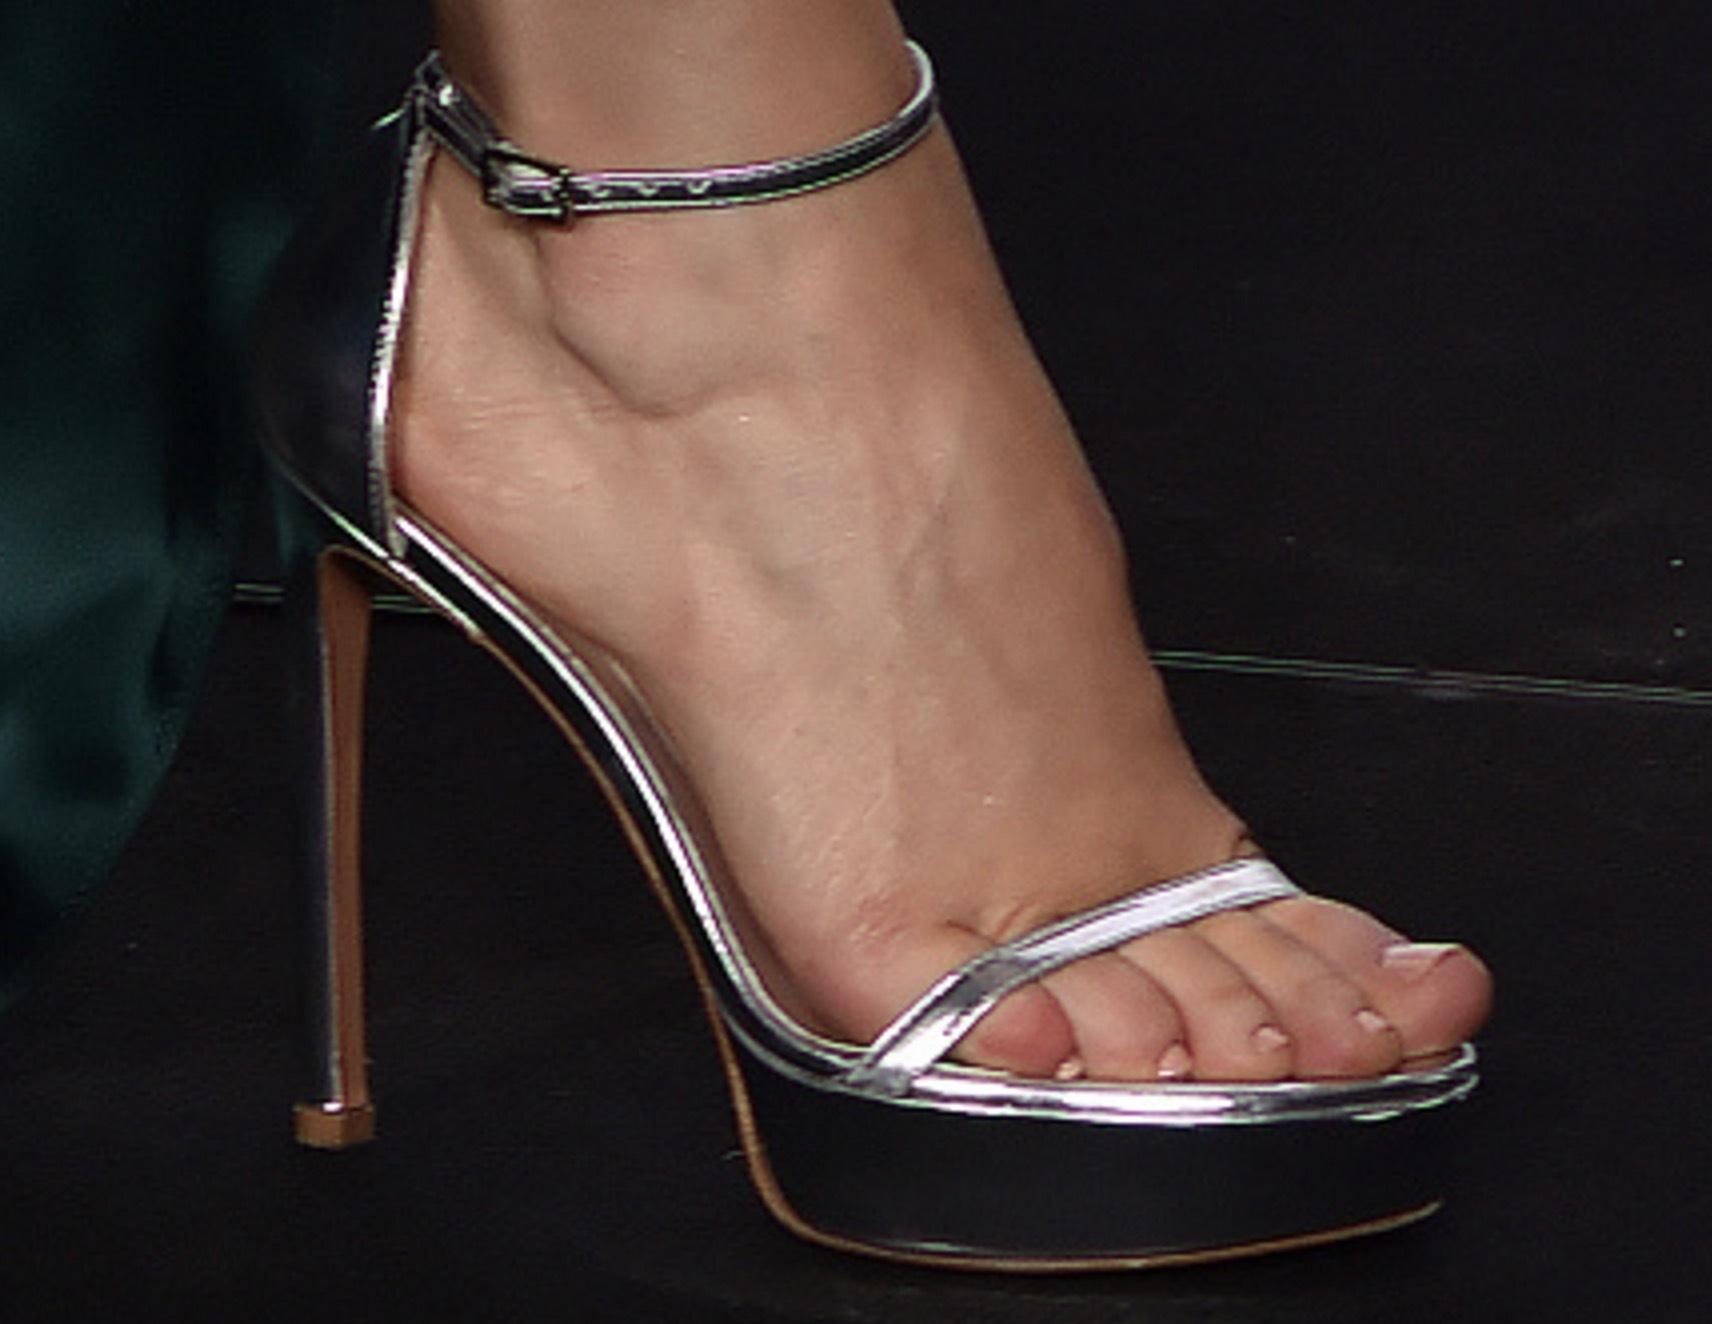 Feet Rachel McAdams nudes (43 photo), Hot